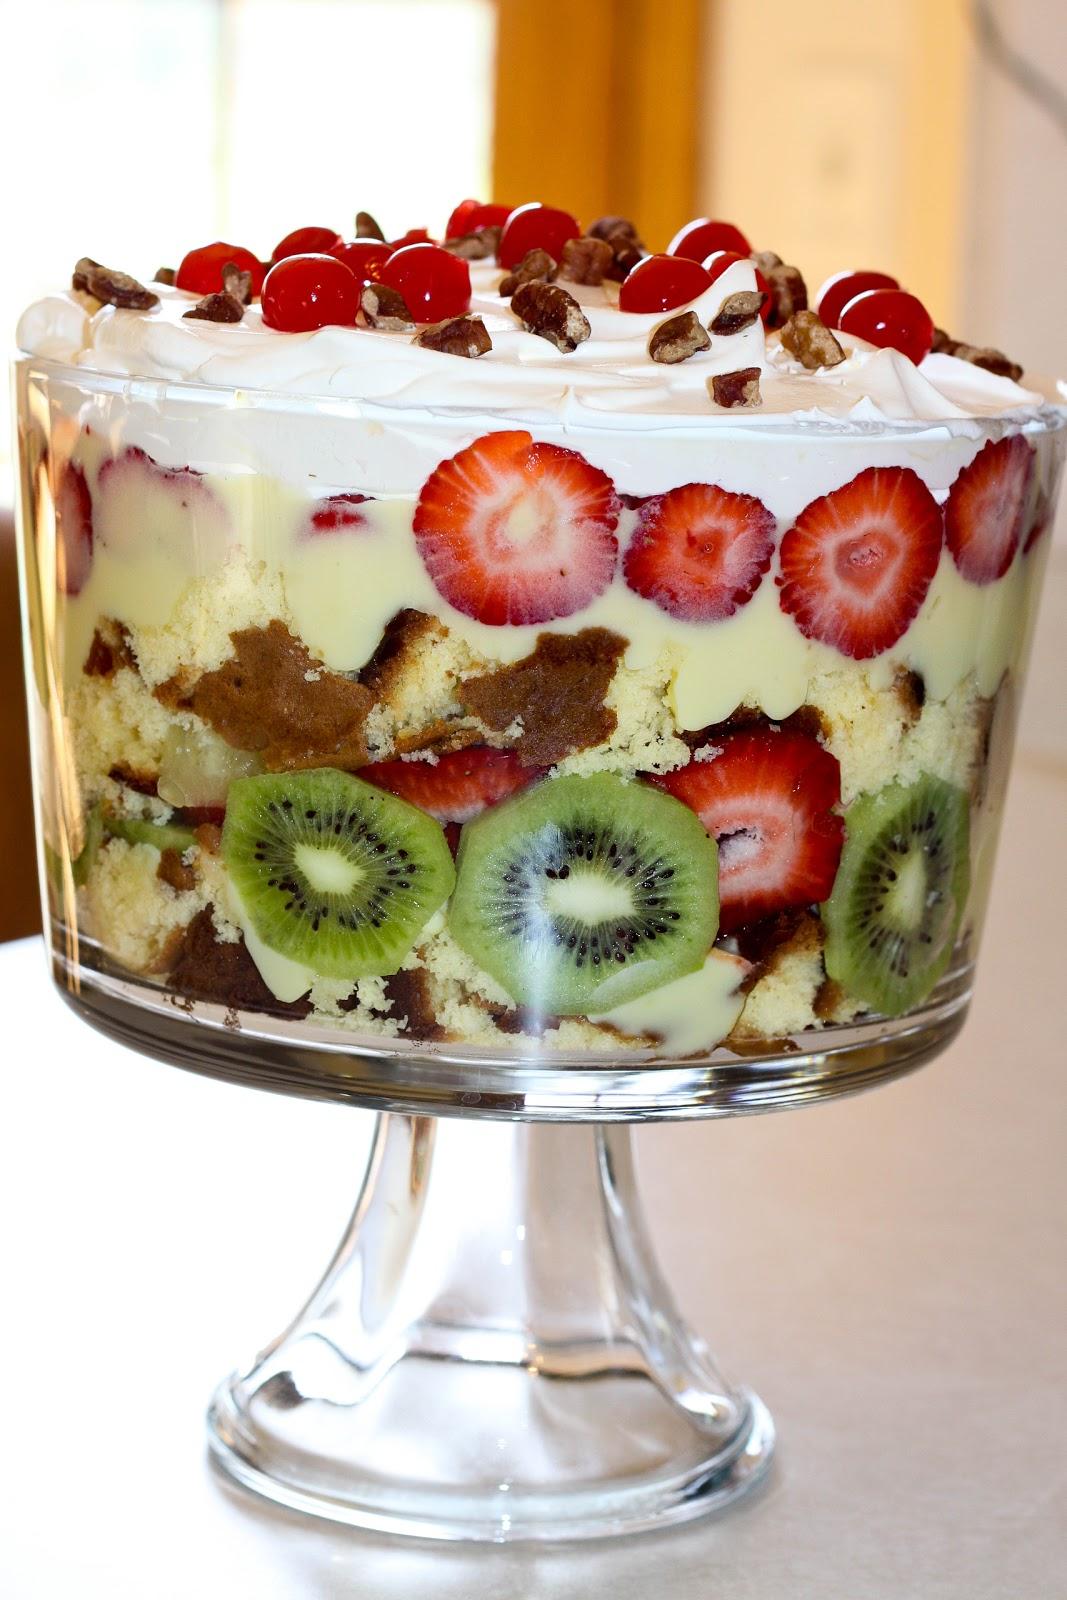 Fruit Cake With Pineapple Chunks